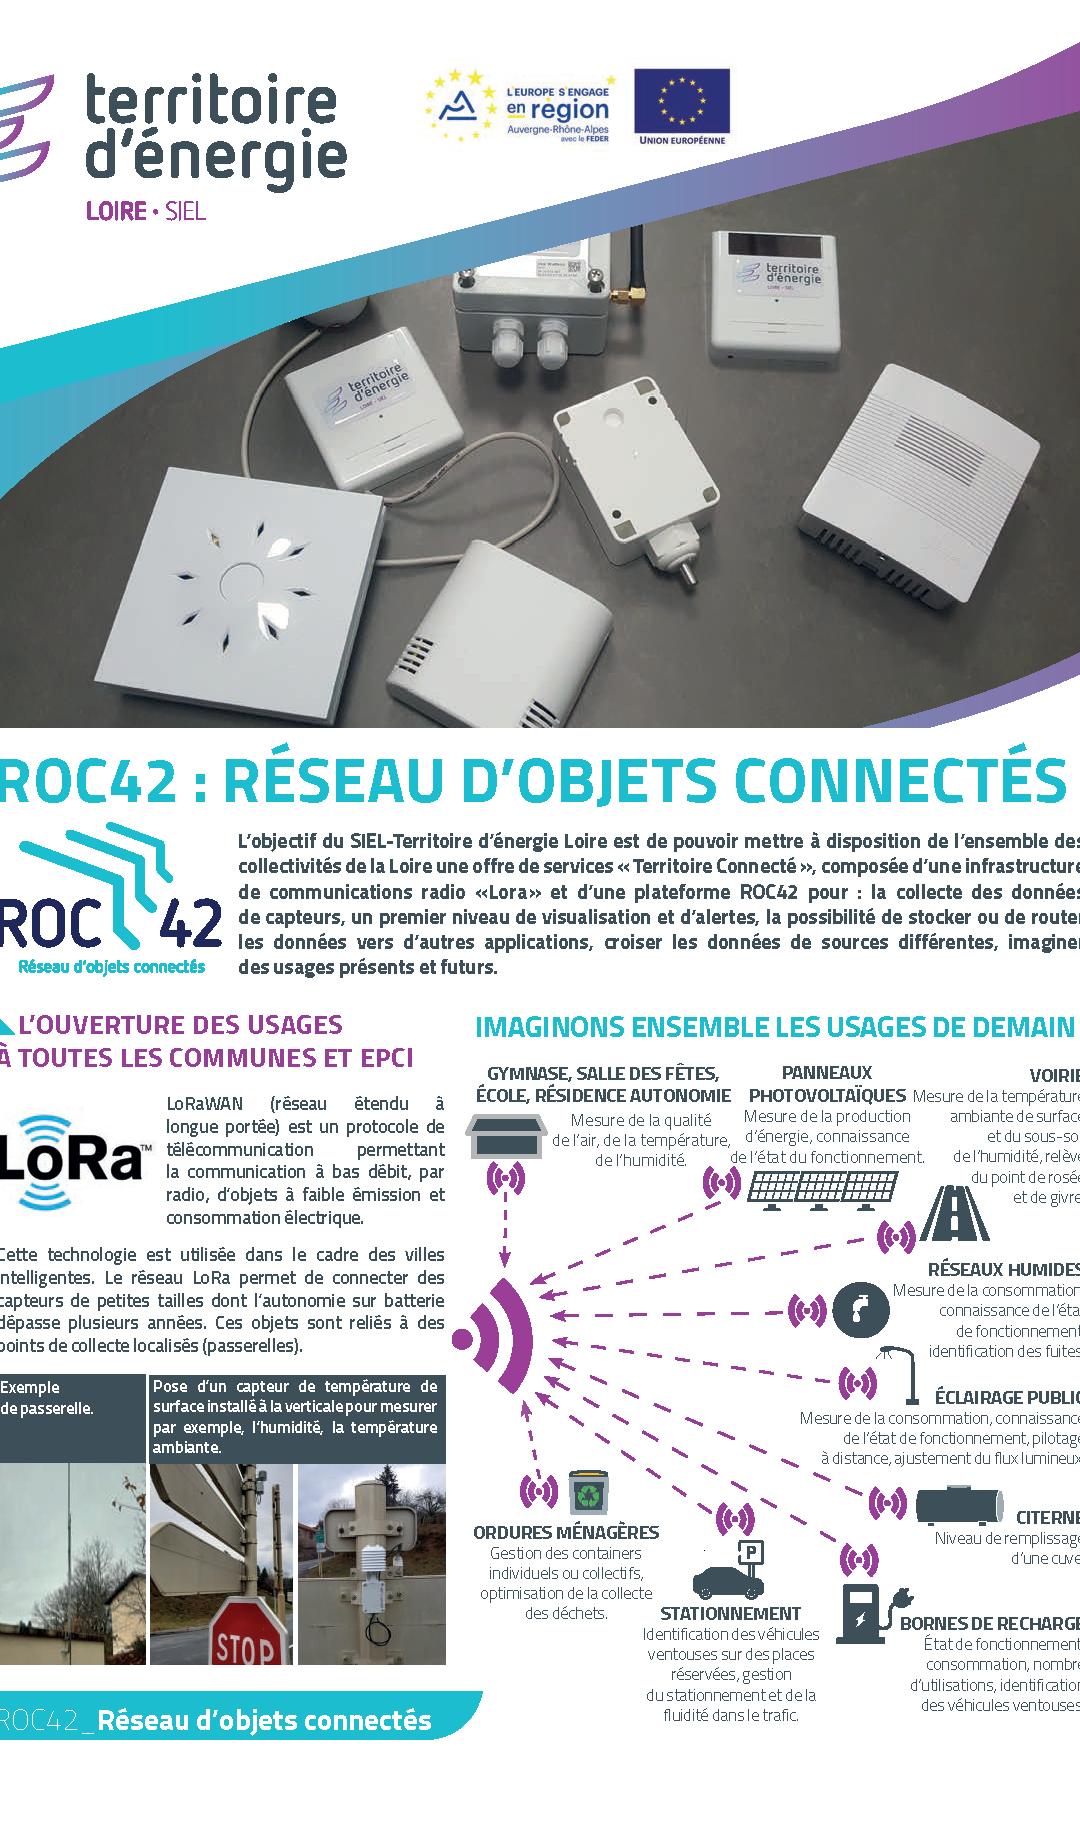 ROC42